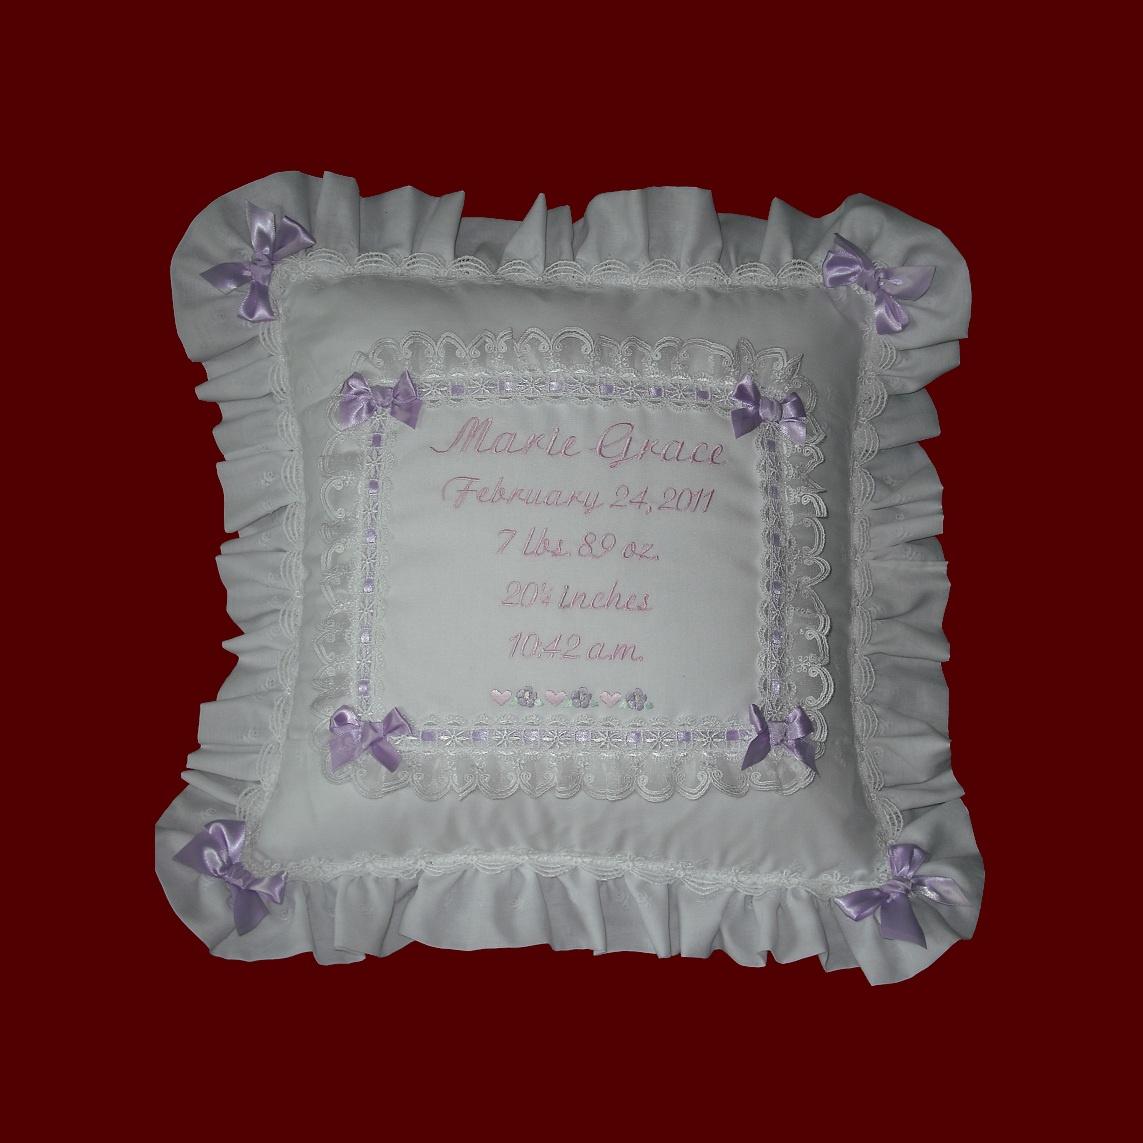 personalized keepsake baby girl eyelet pillow pillows smocked treasures. Black Bedroom Furniture Sets. Home Design Ideas